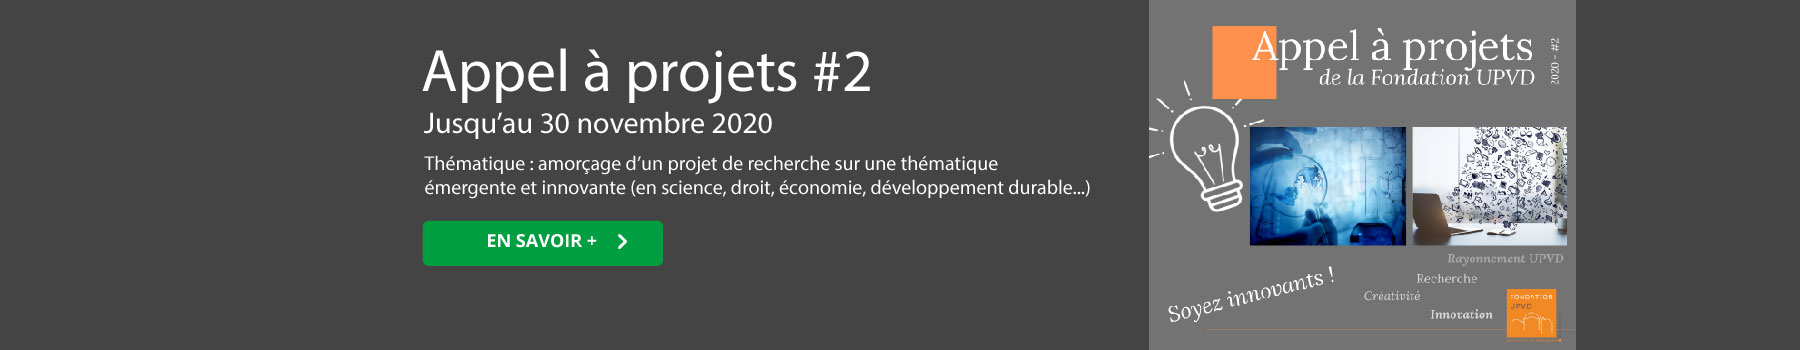 SLIDES-AAP2020-2-01